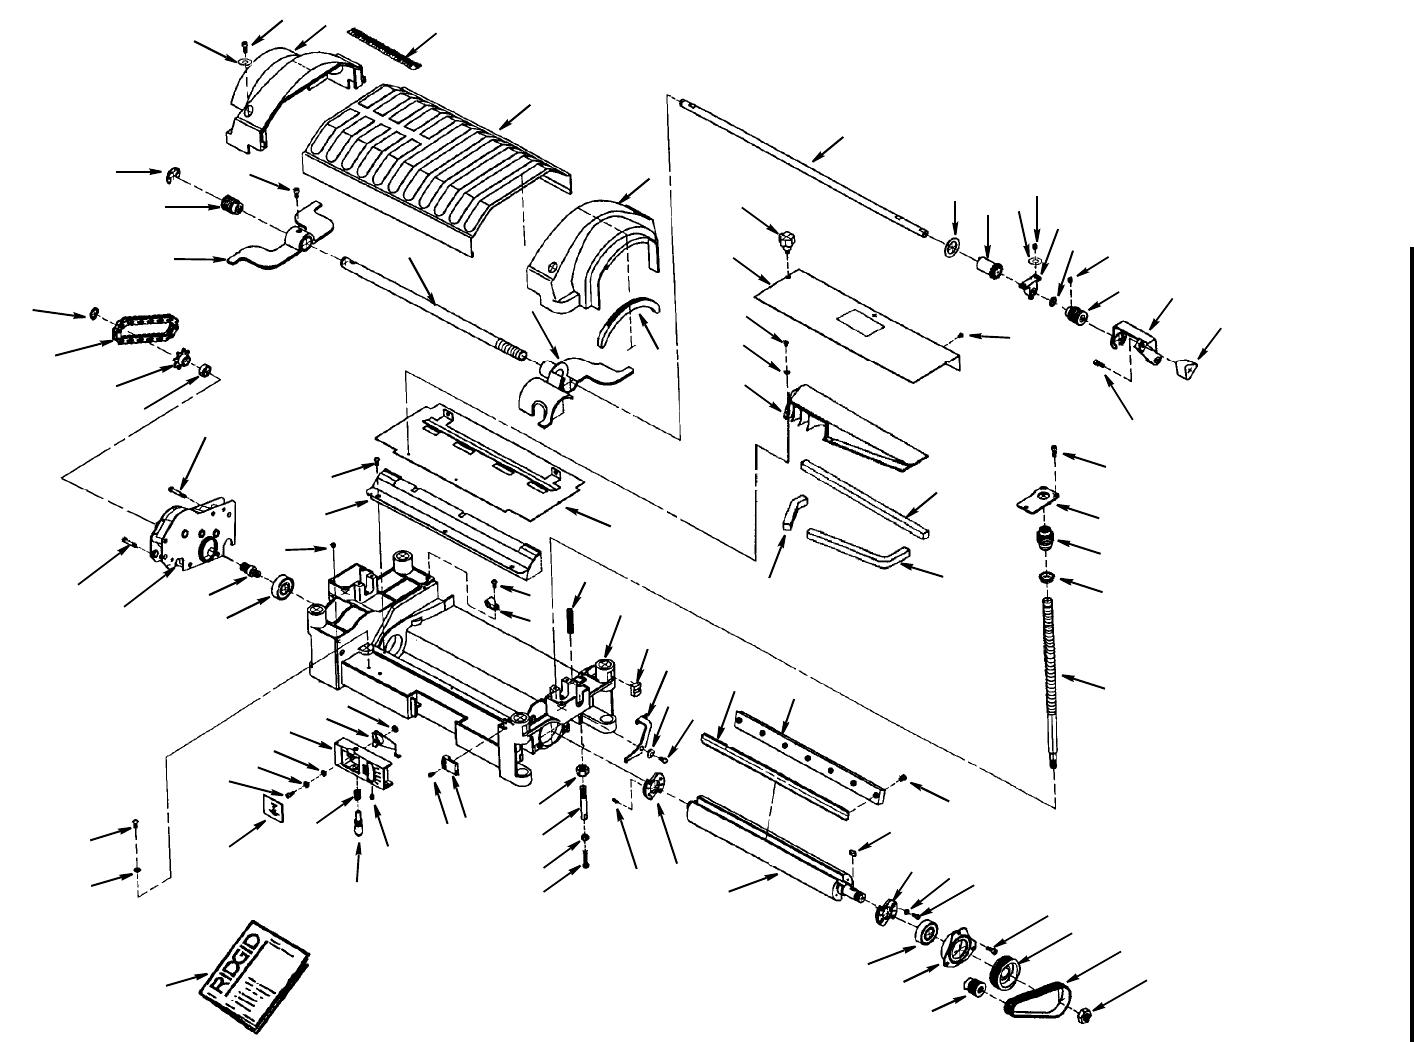 Ridgid Tp1300 Users Manual